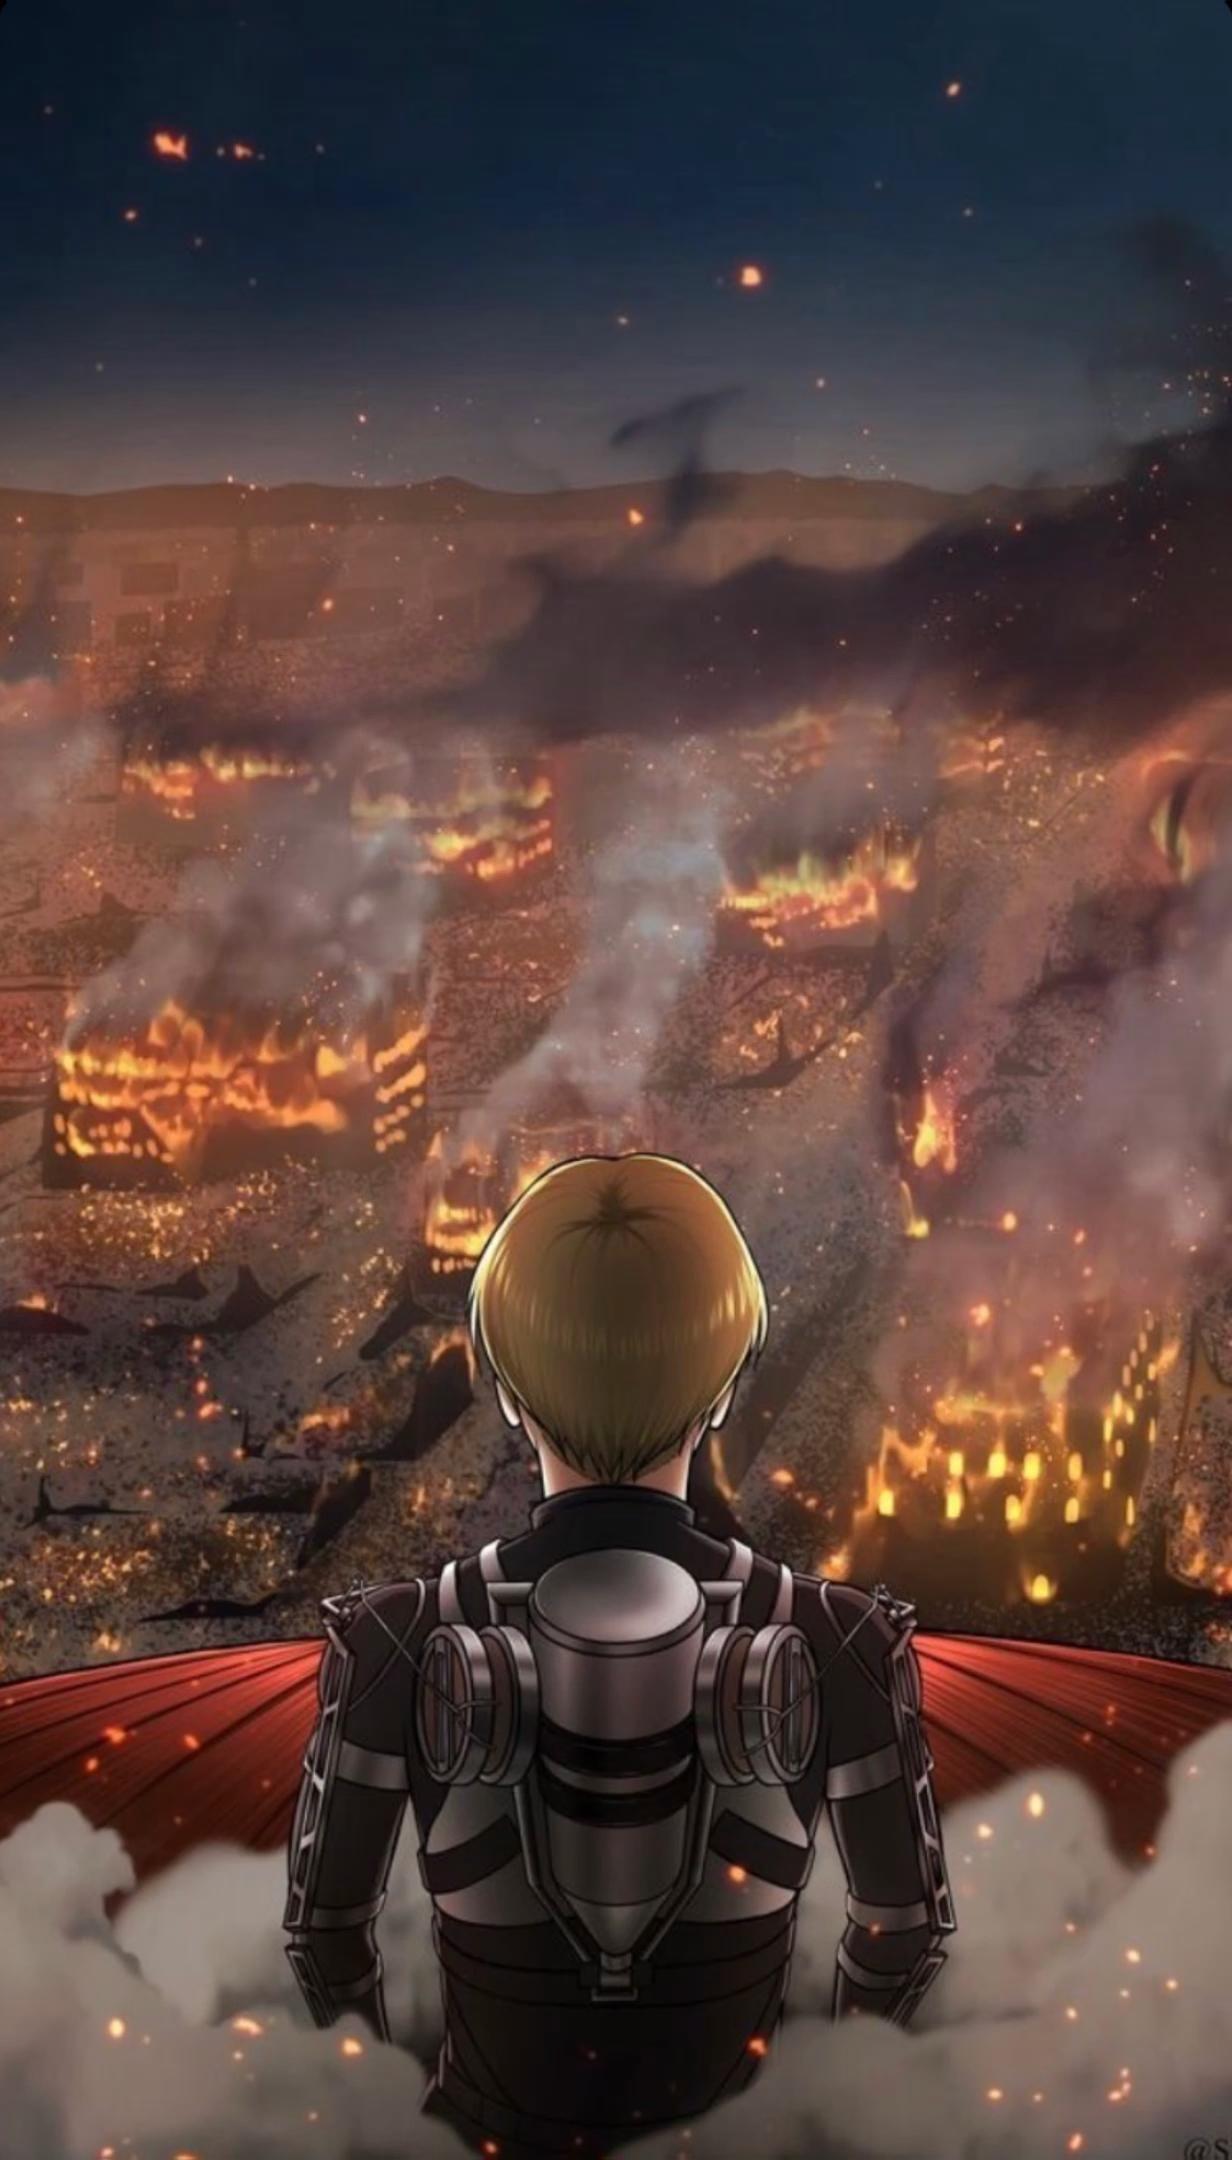 Armin Alert Colossal Titan